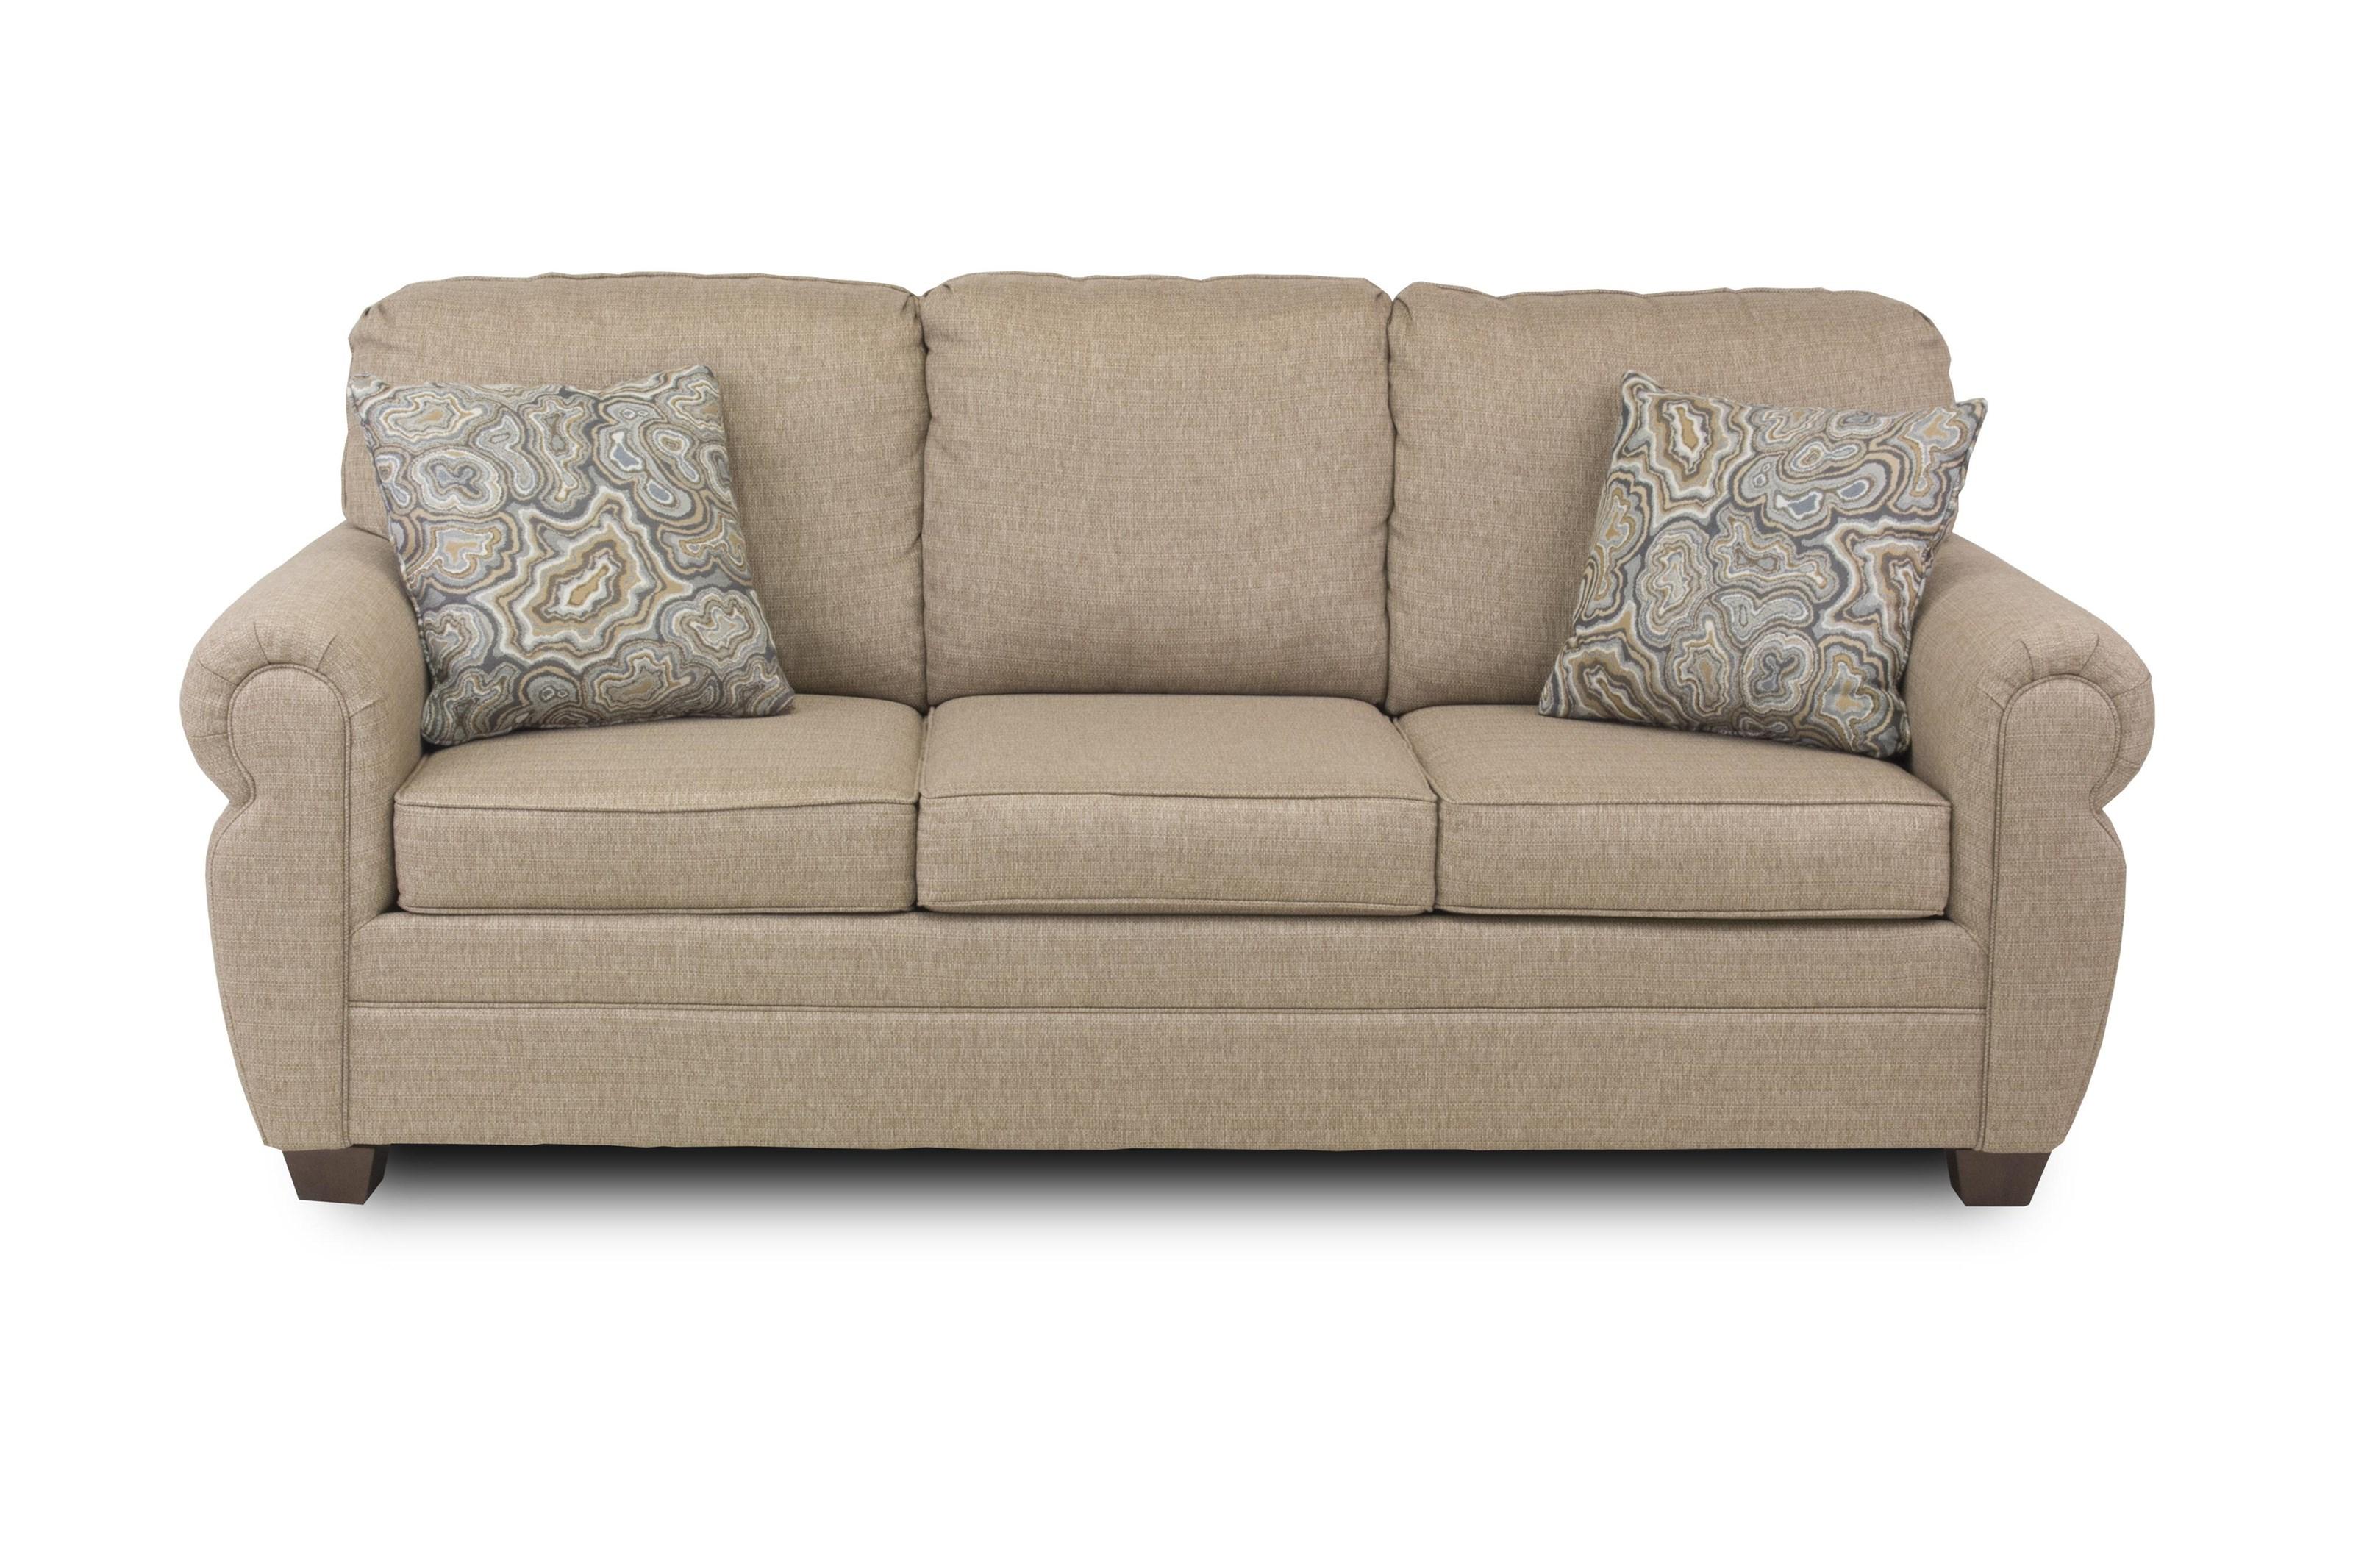 Metropia WaylonRolled Arm Sofa ...